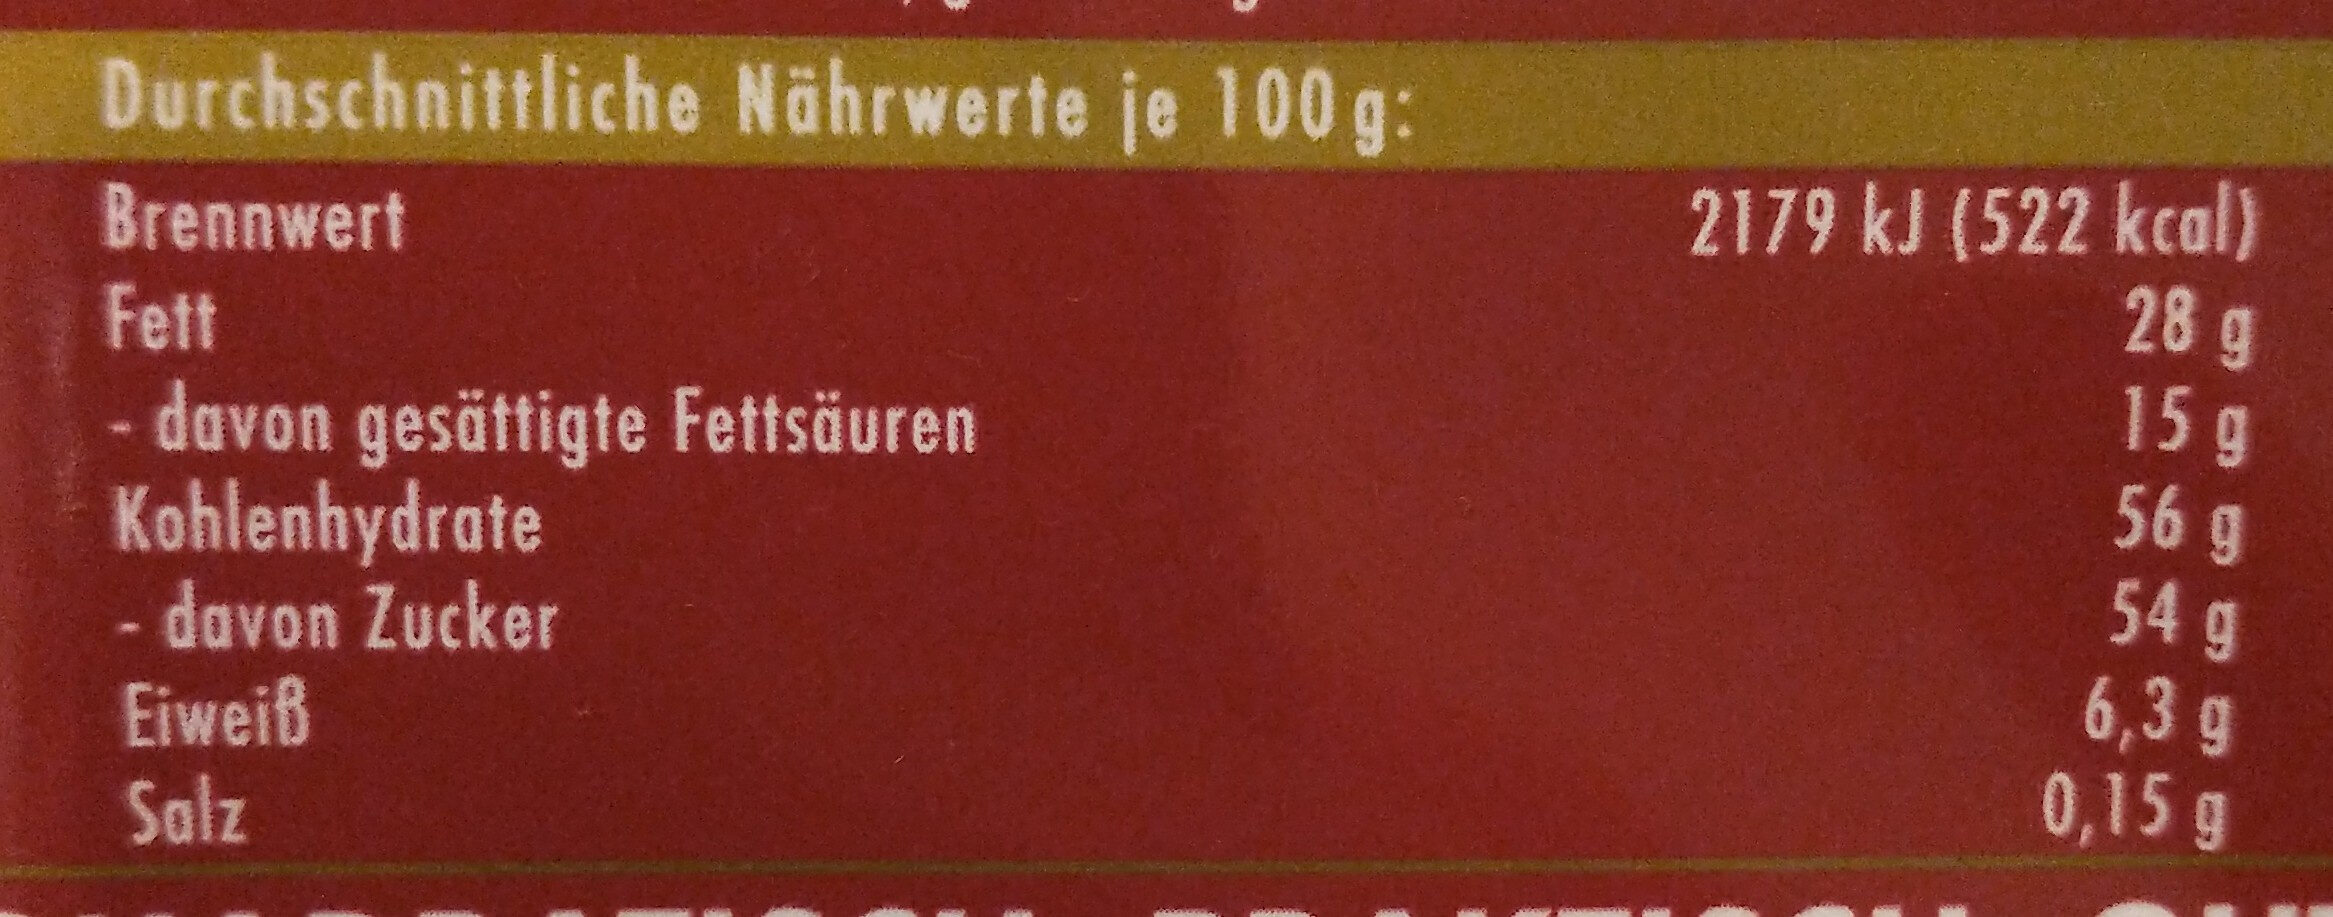 Rum Trauben Nuss - Nutrition facts - de